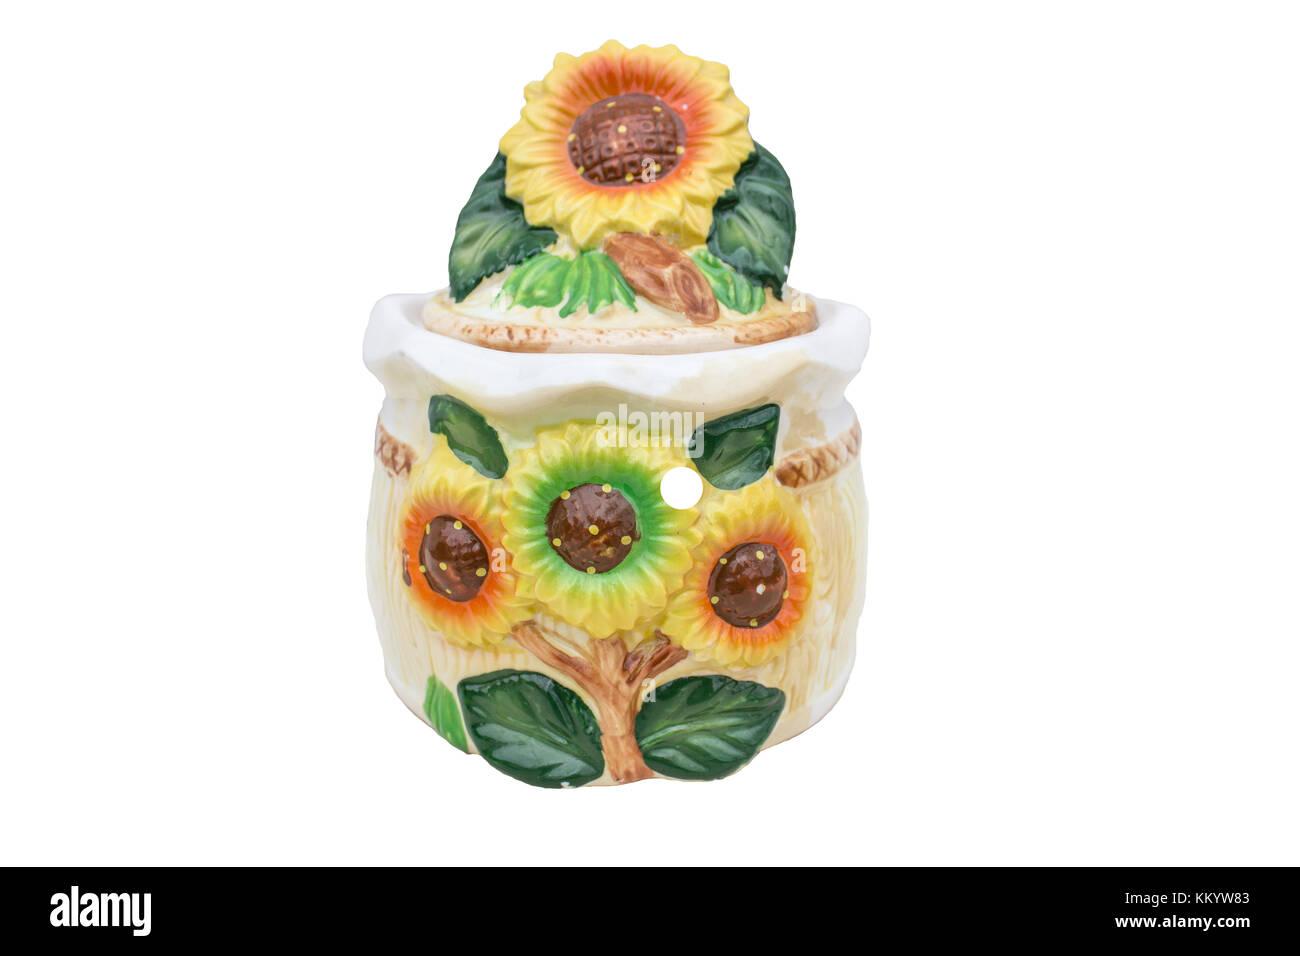 Souvenir box for storing various trifles 'Sunflower' - Stock Image